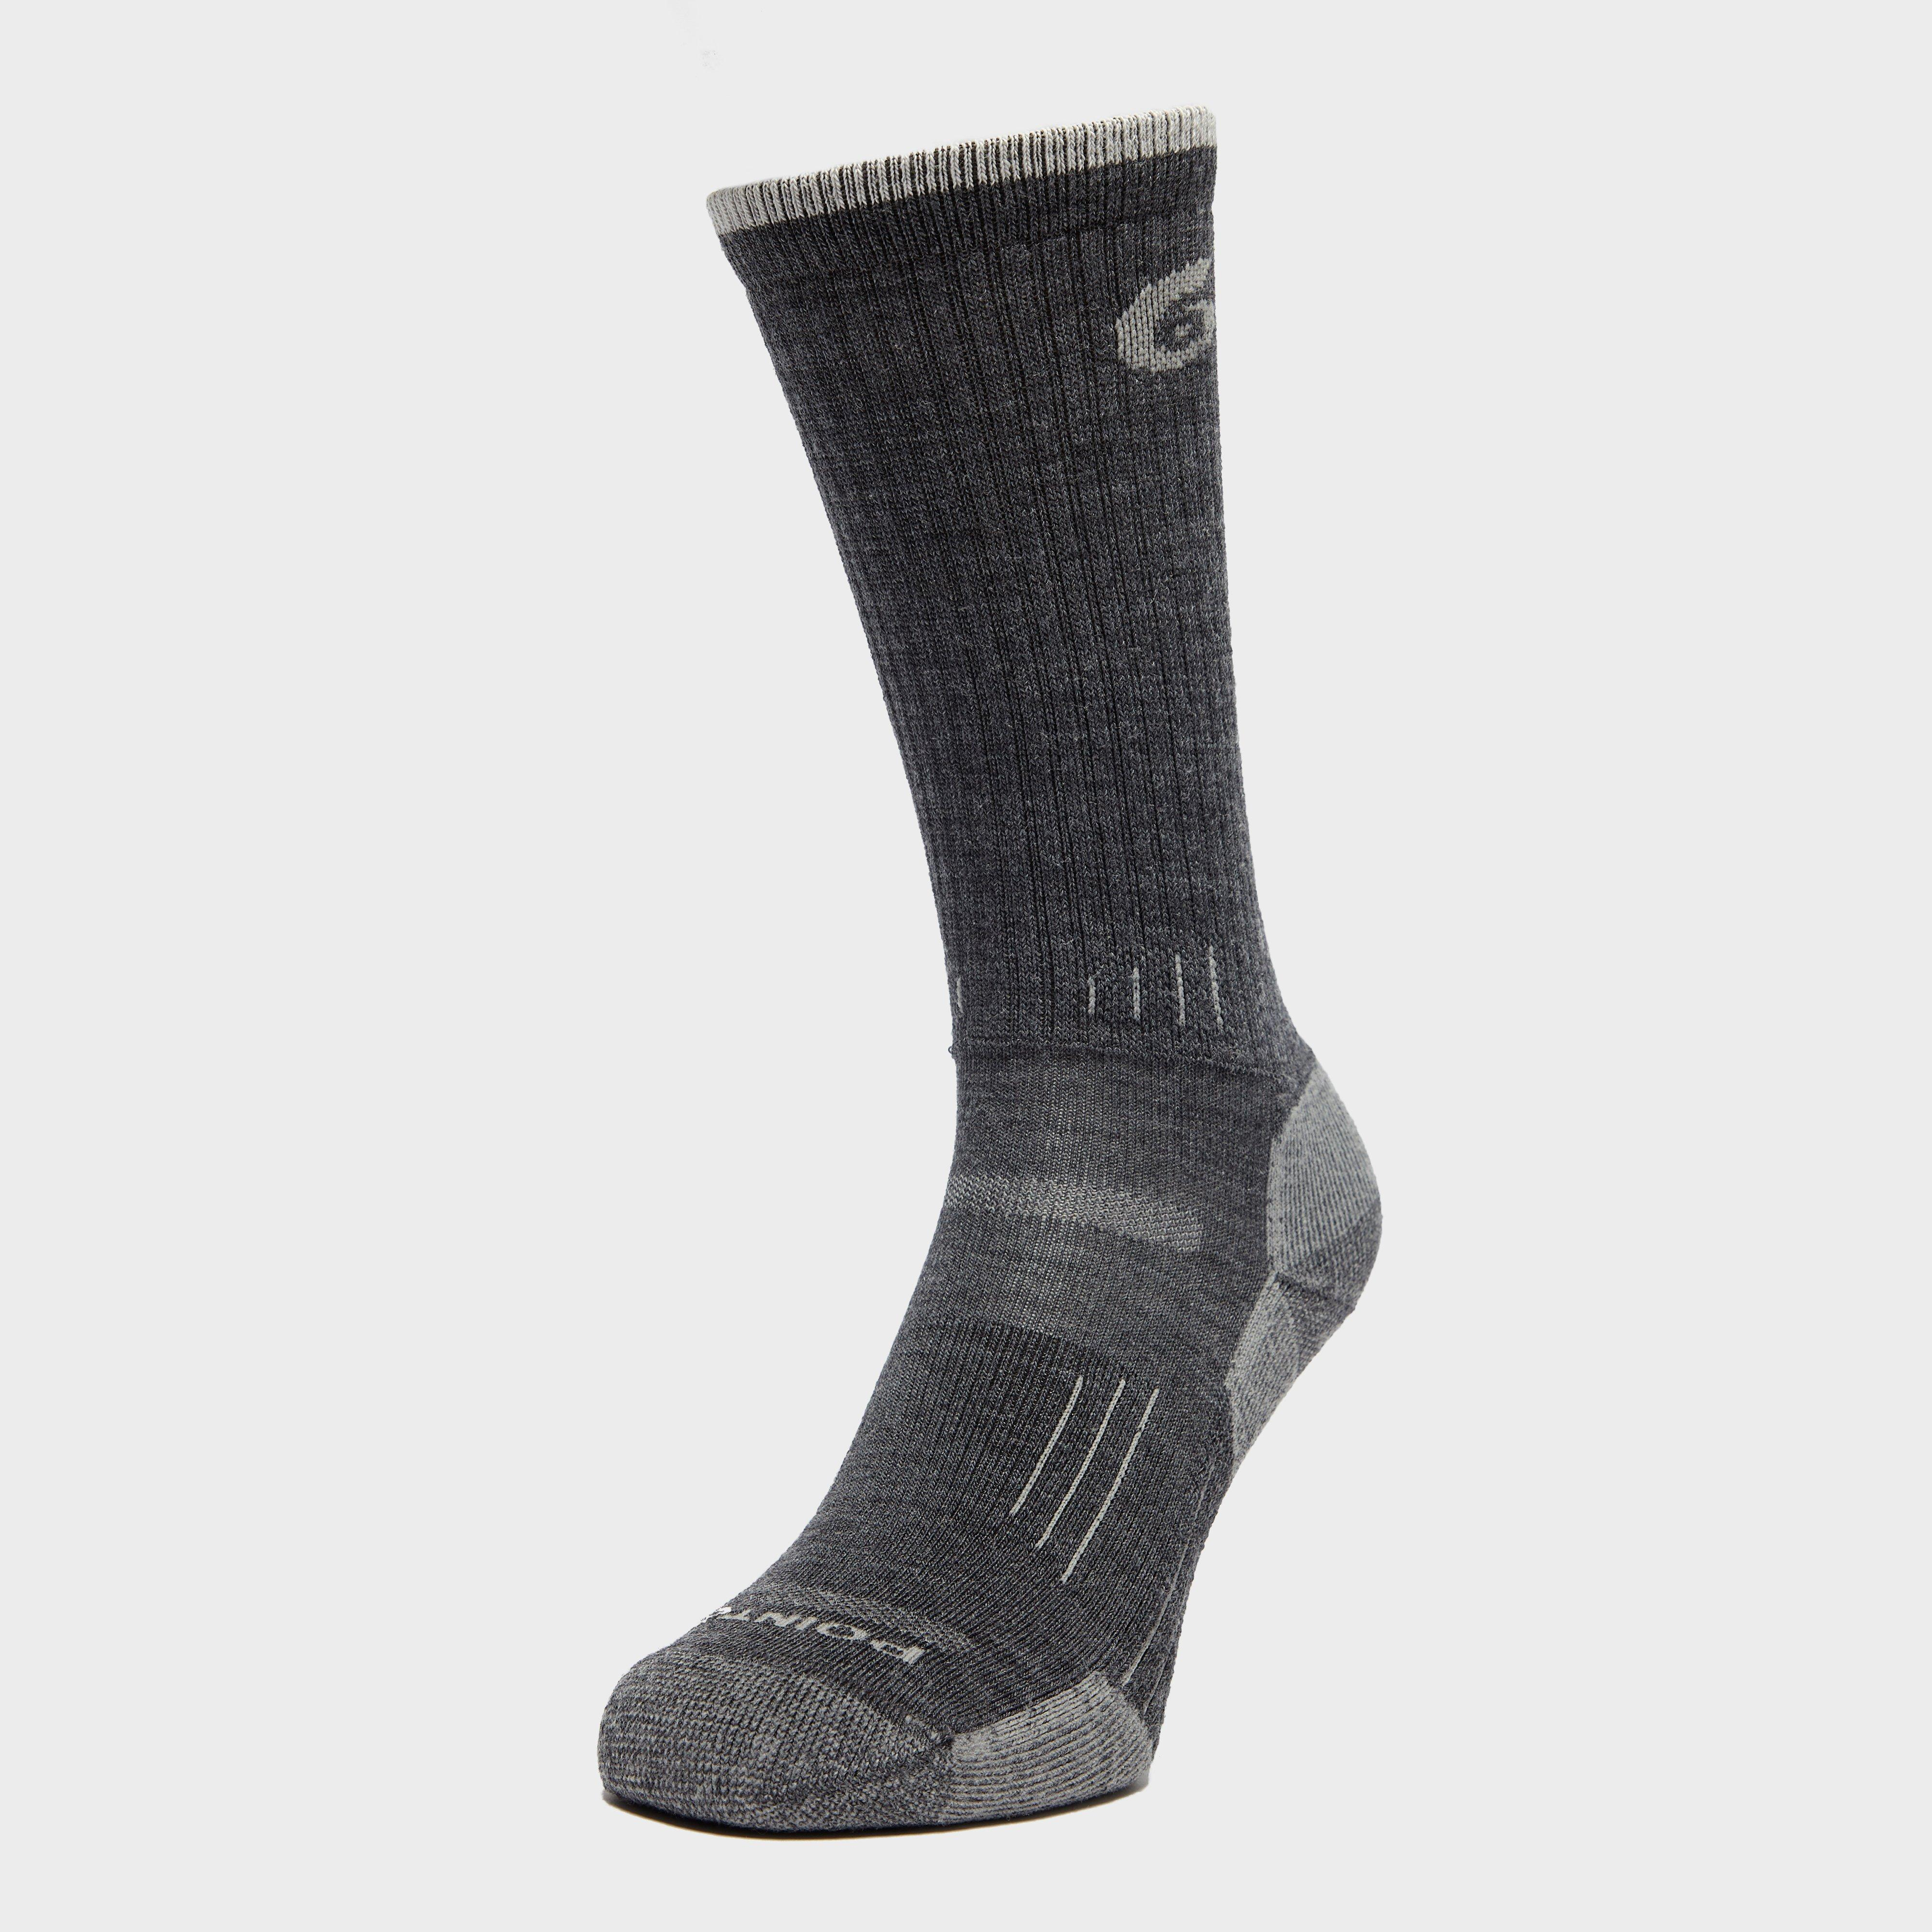 Point6 Women's Hiking Essential Light Socks, Grey